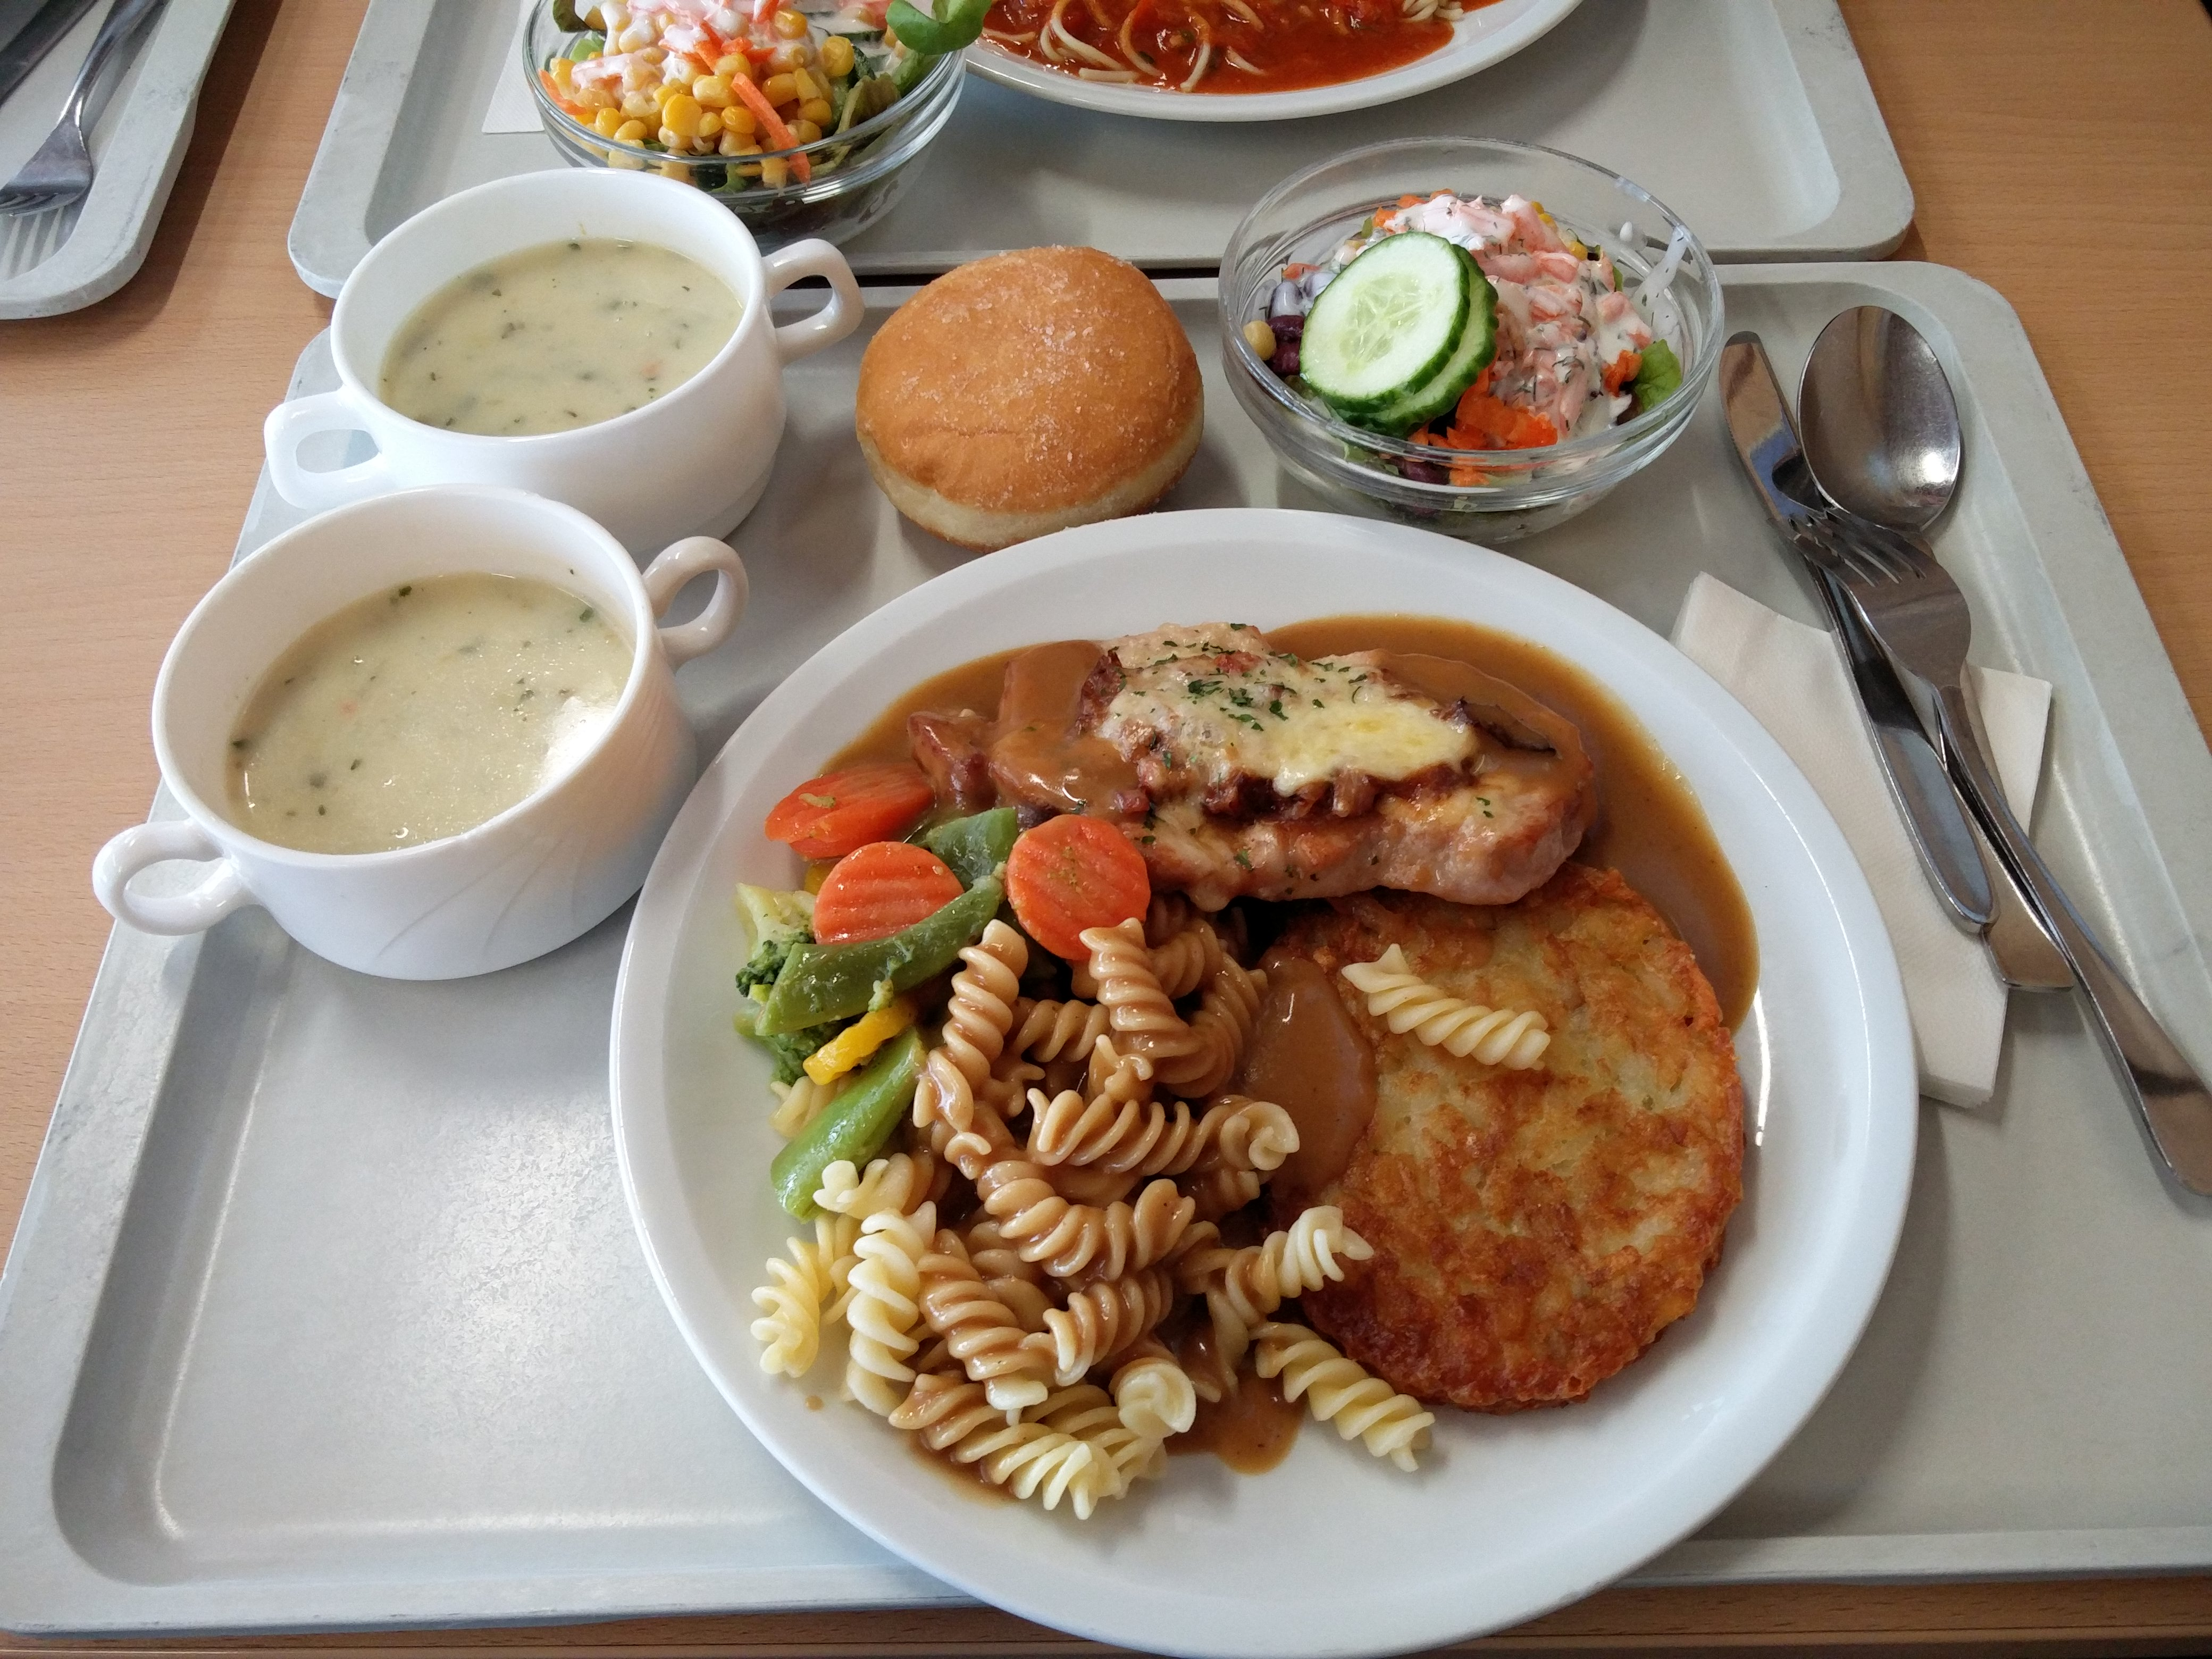 https://foodloader.net/nico_2016-04-05_fleisch-kartoffelpuffer-nudeln-gemuese-suppen-salat-berliner.jpg